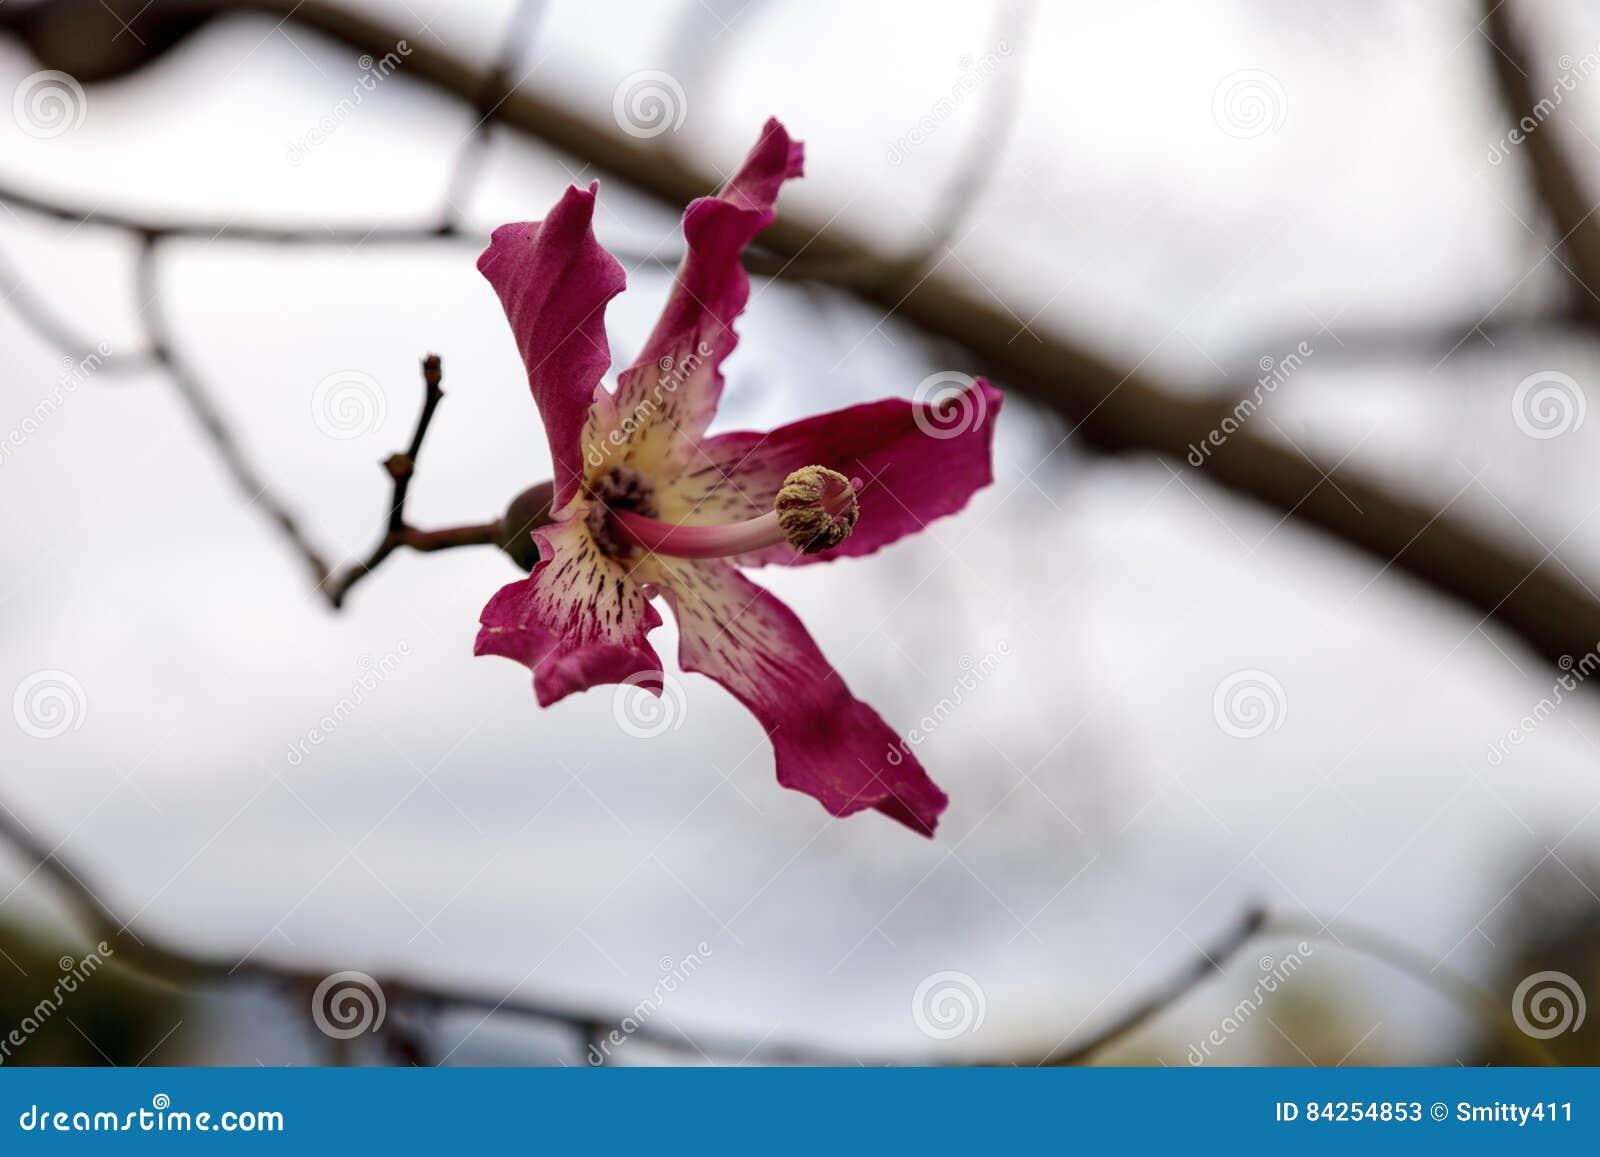 Pink And White Dogwood Flower Stock Image Image Of White Flower